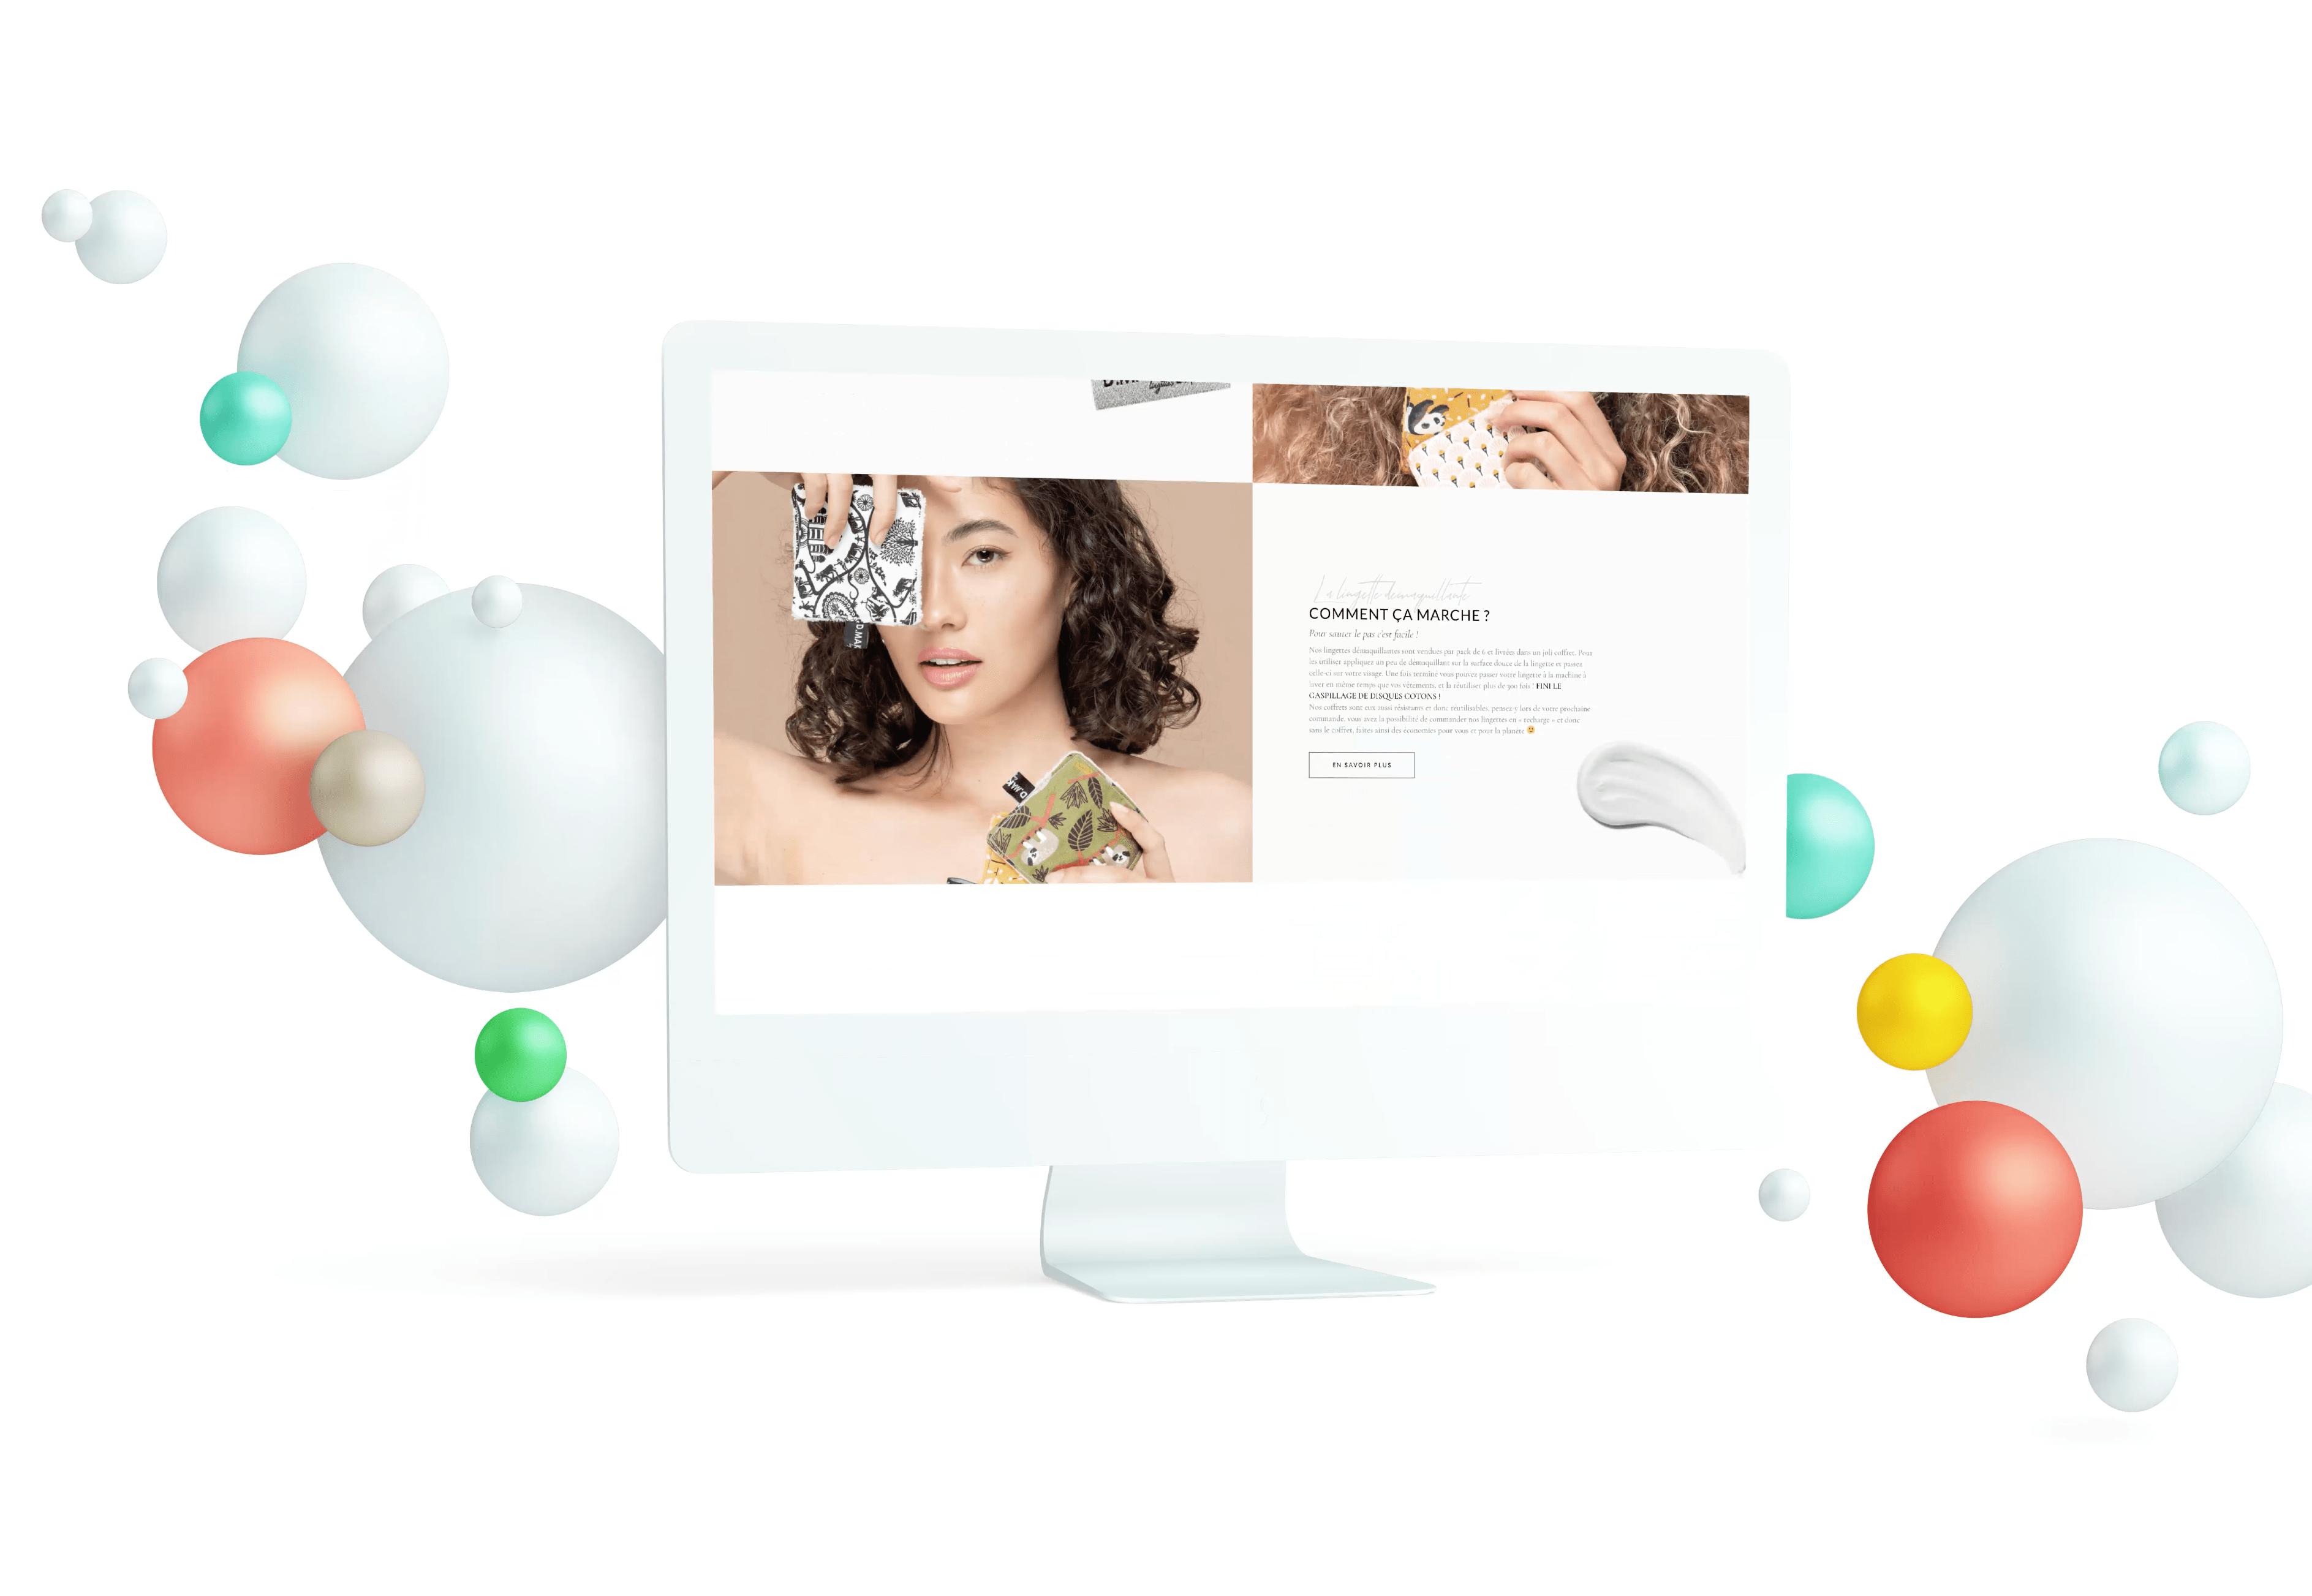 creation de marque web design